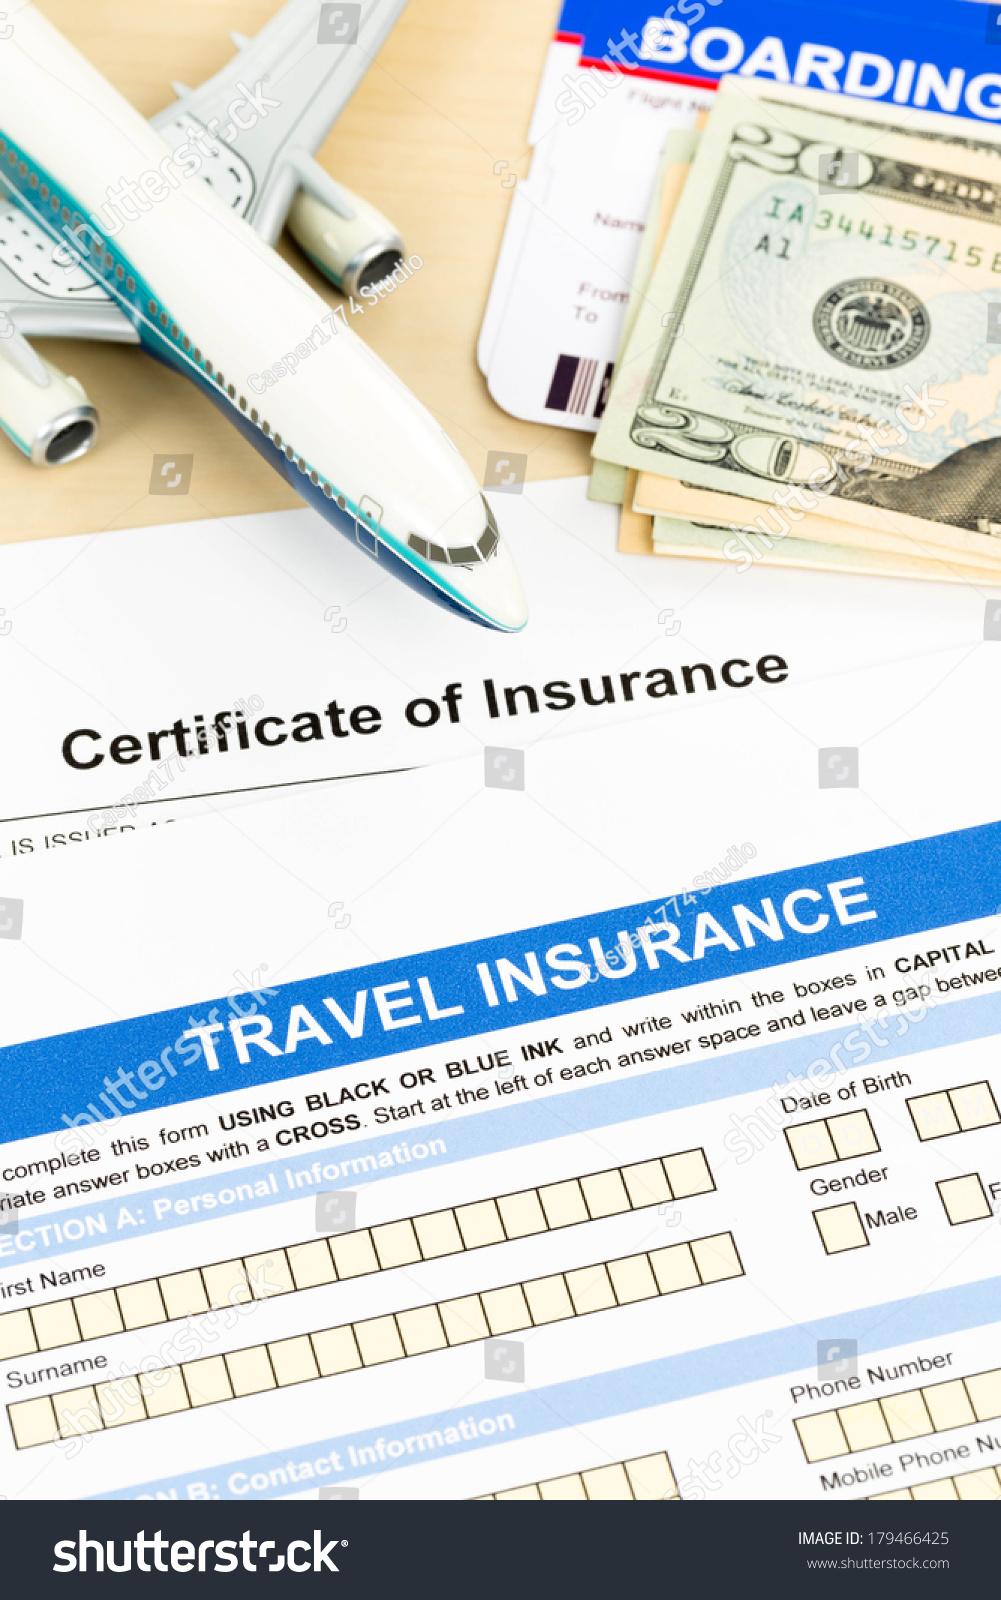 Travel Insurance Application Form Plane Model Stock Photo Edit Now